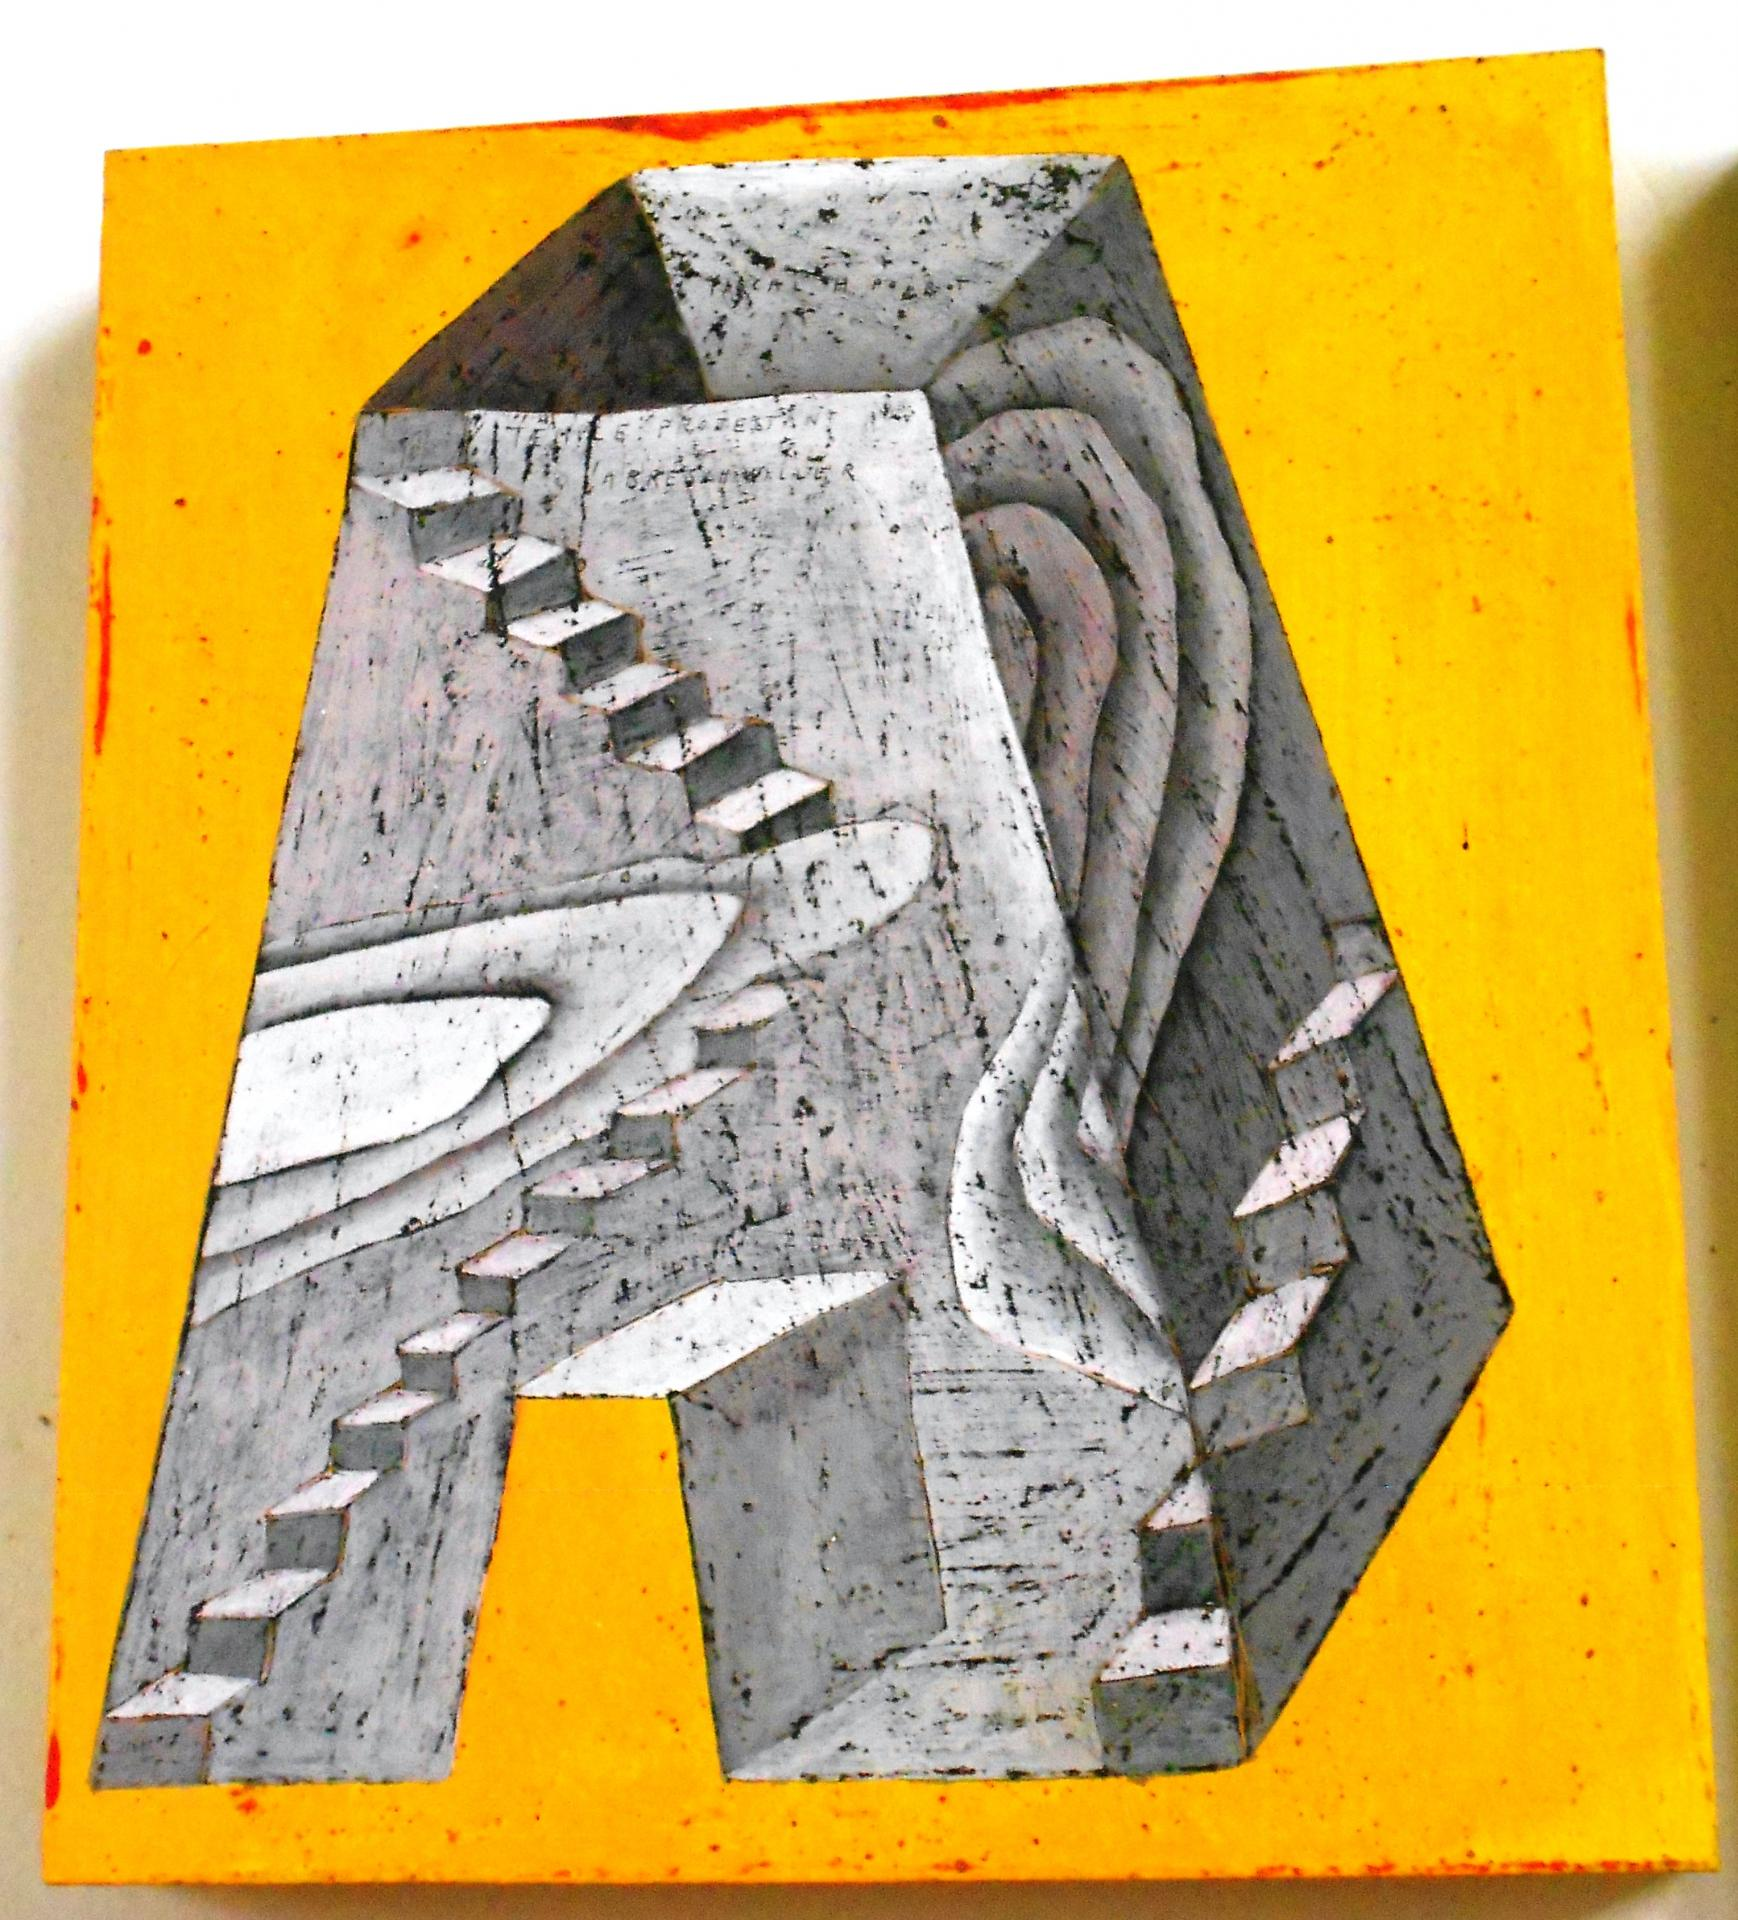 Escalier ziggurat